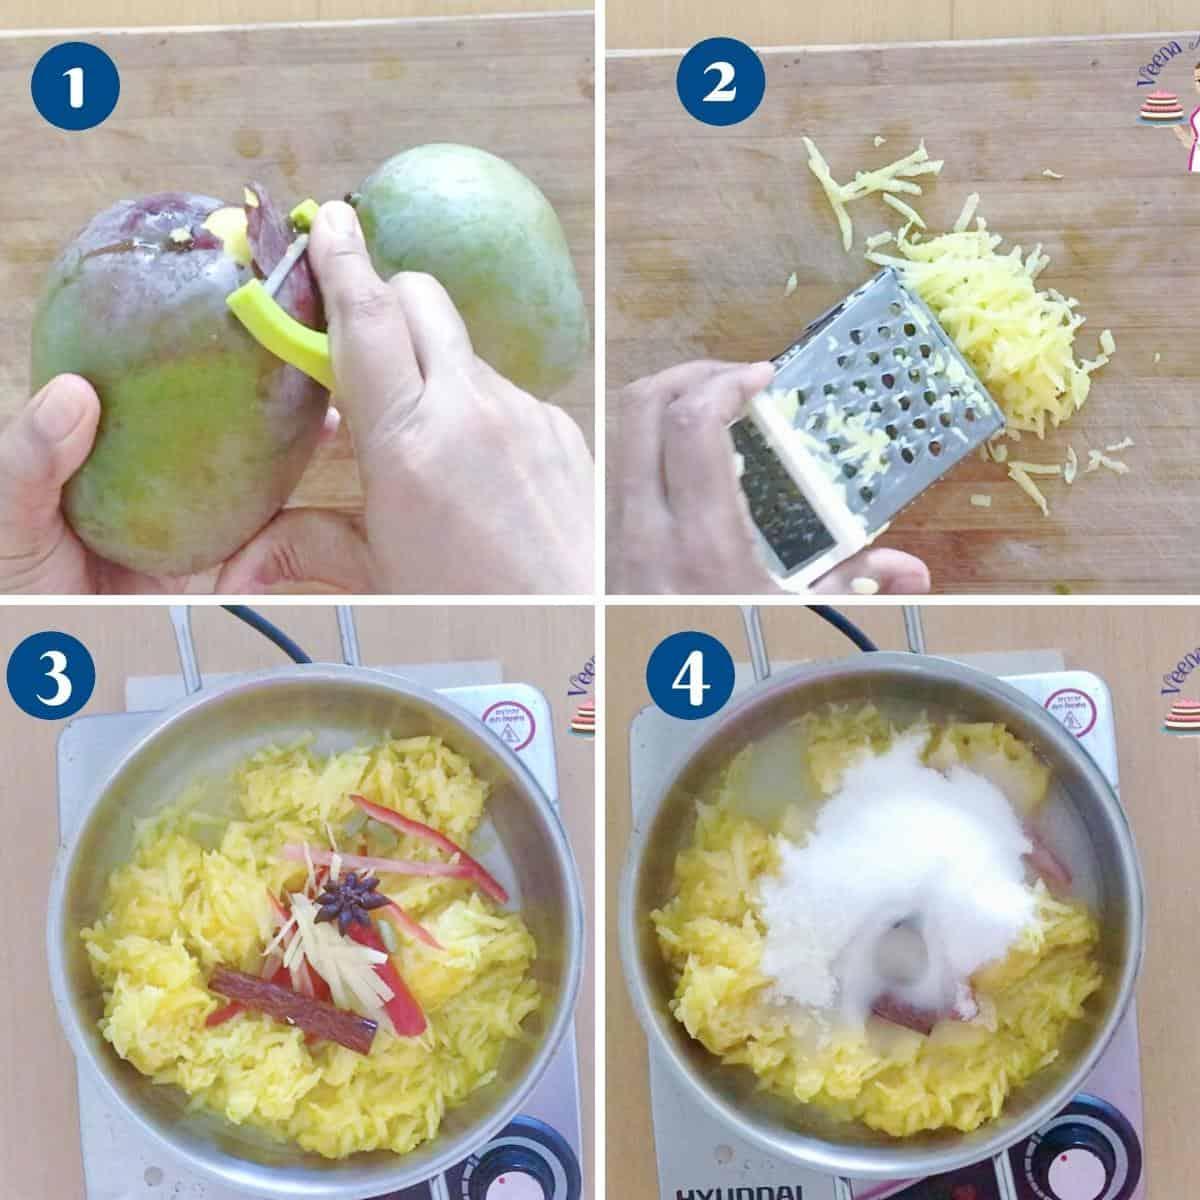 Progress pictures making mango chutney.